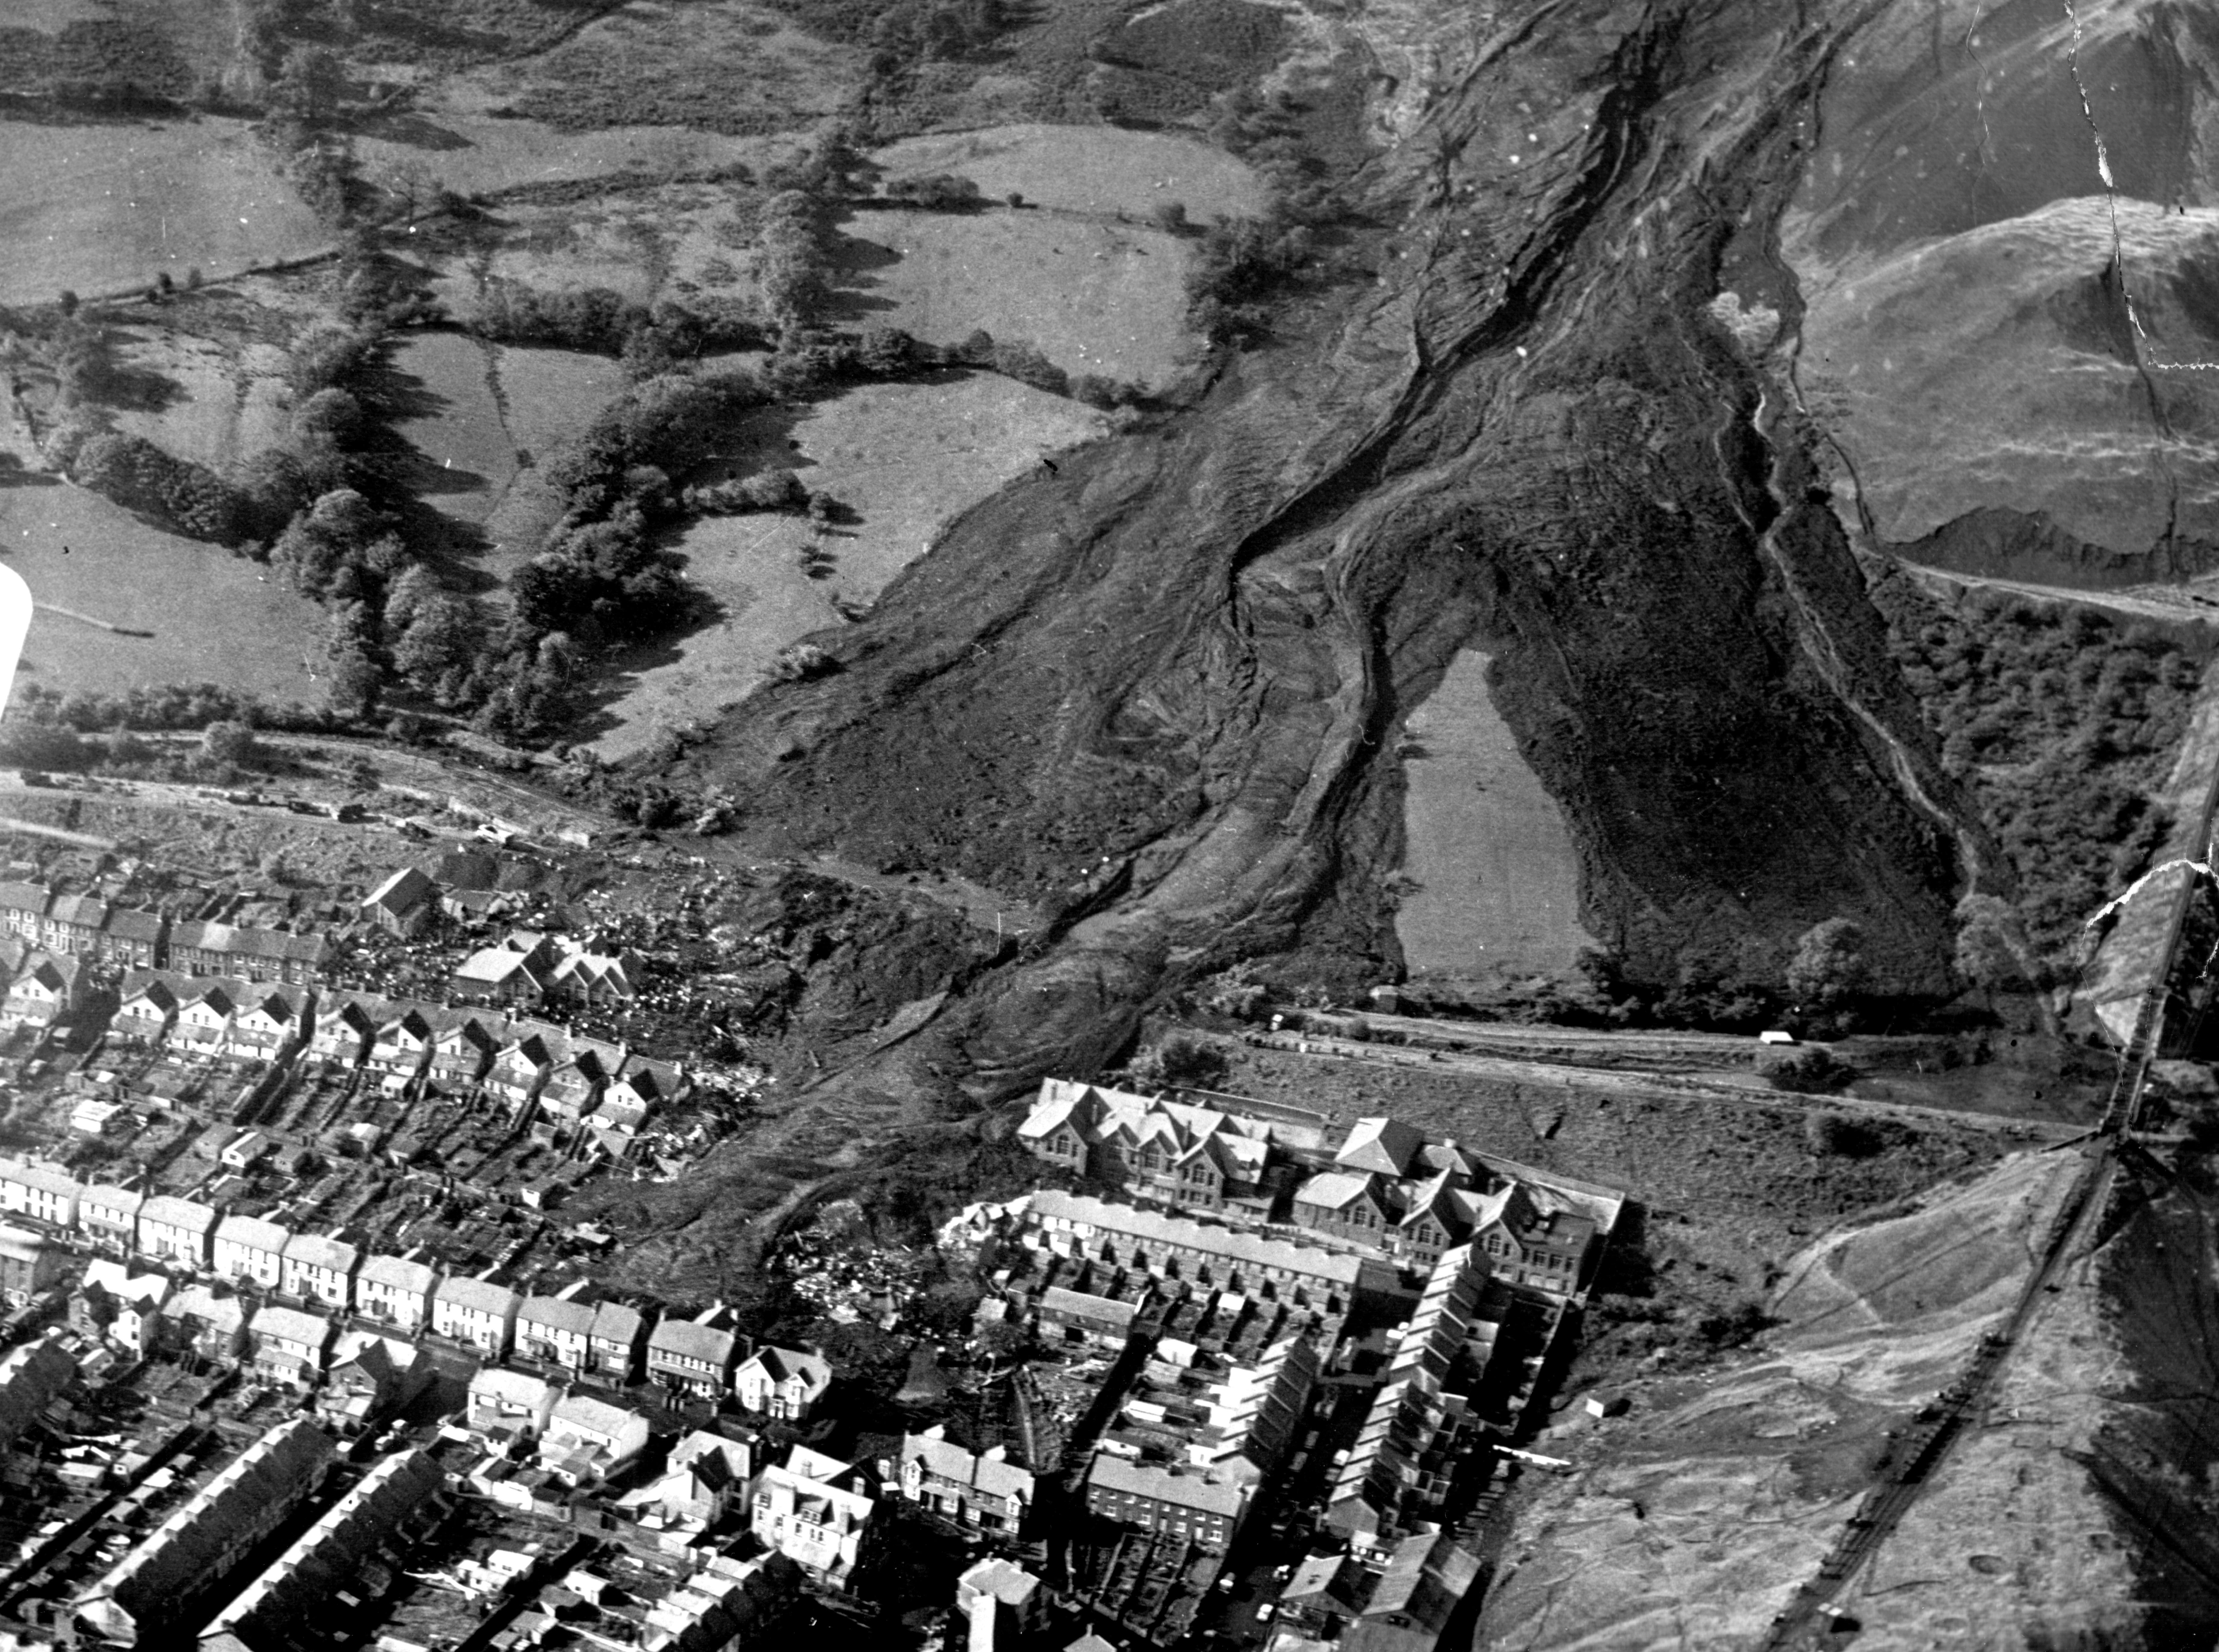 50 years ago a coal waste tip fell on a school in the Welsh mining village of Aberfan, killing 116 children.